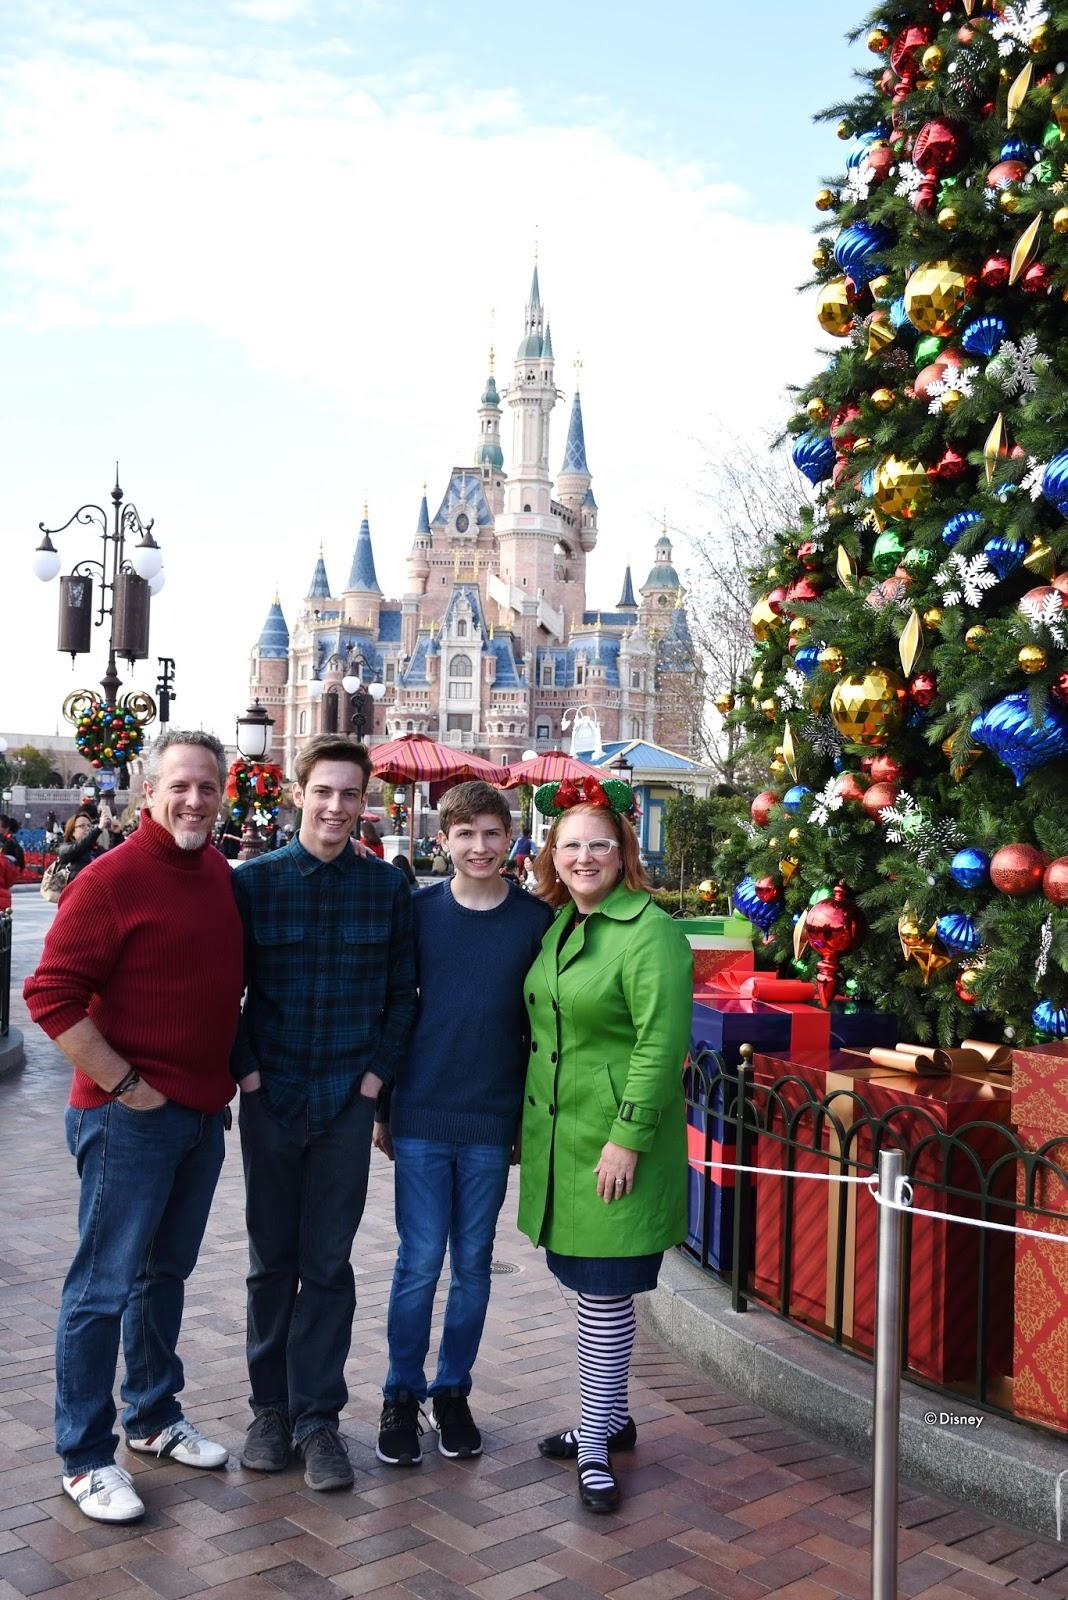 My Wandering Life: Merry Christmas from Shanghai Disneyland!